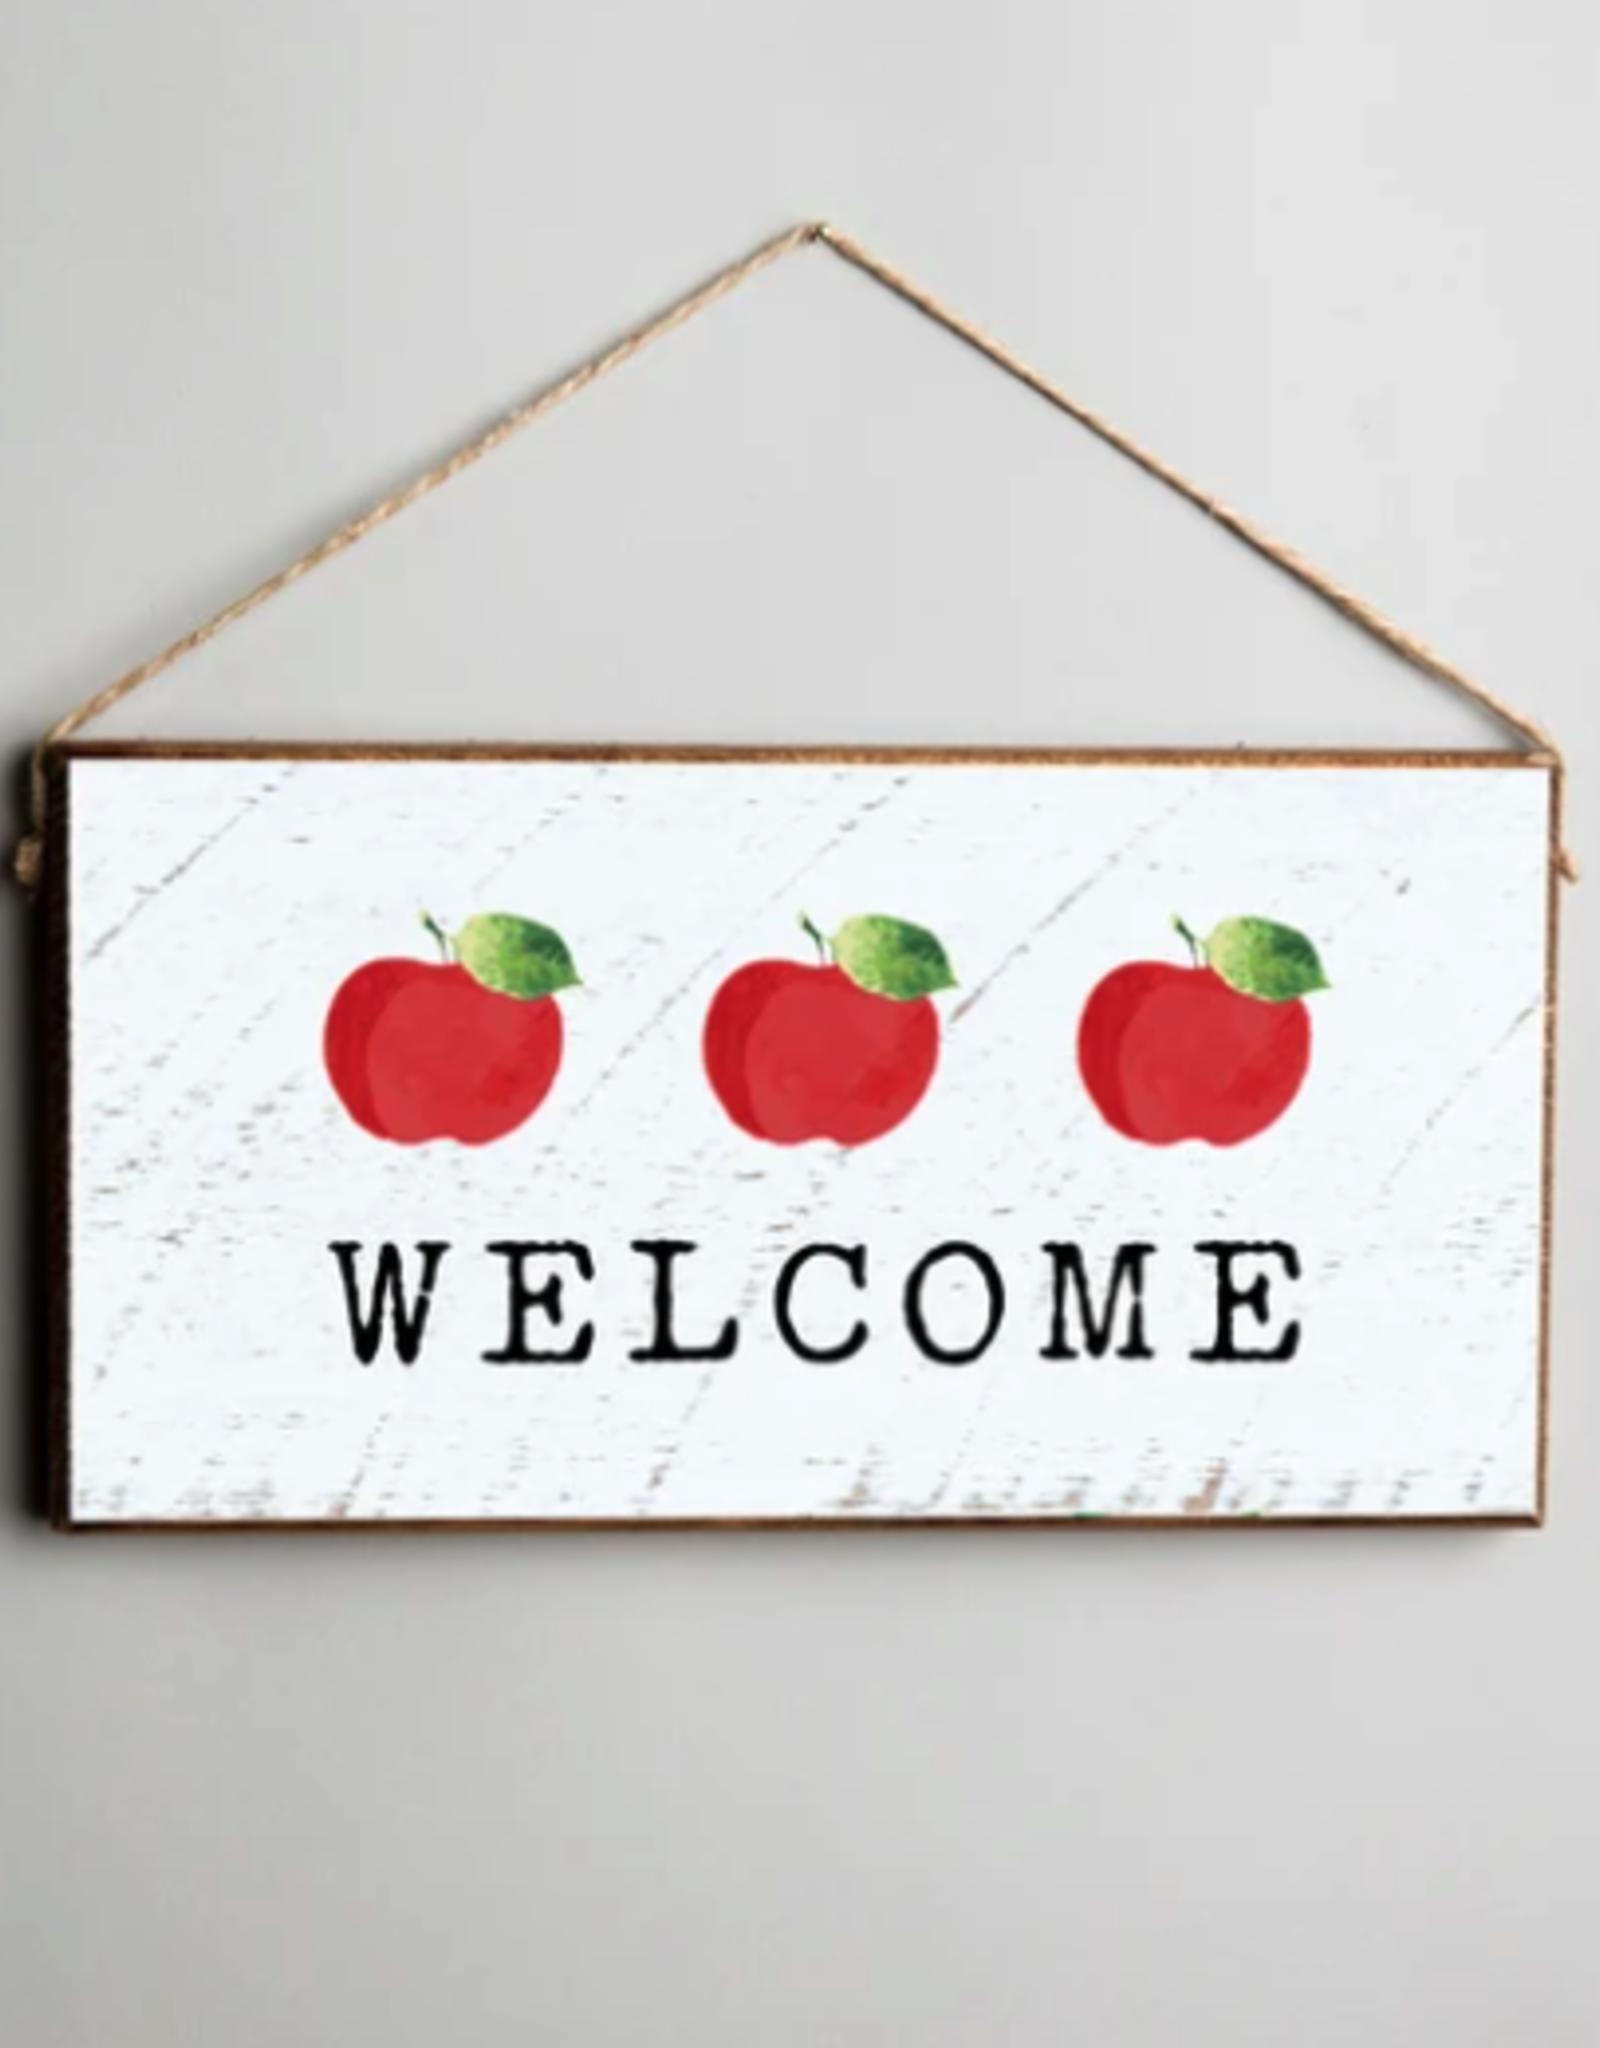 Rustic Marlin Rustic Marlin - Mini Plank - Welcome Three Apples